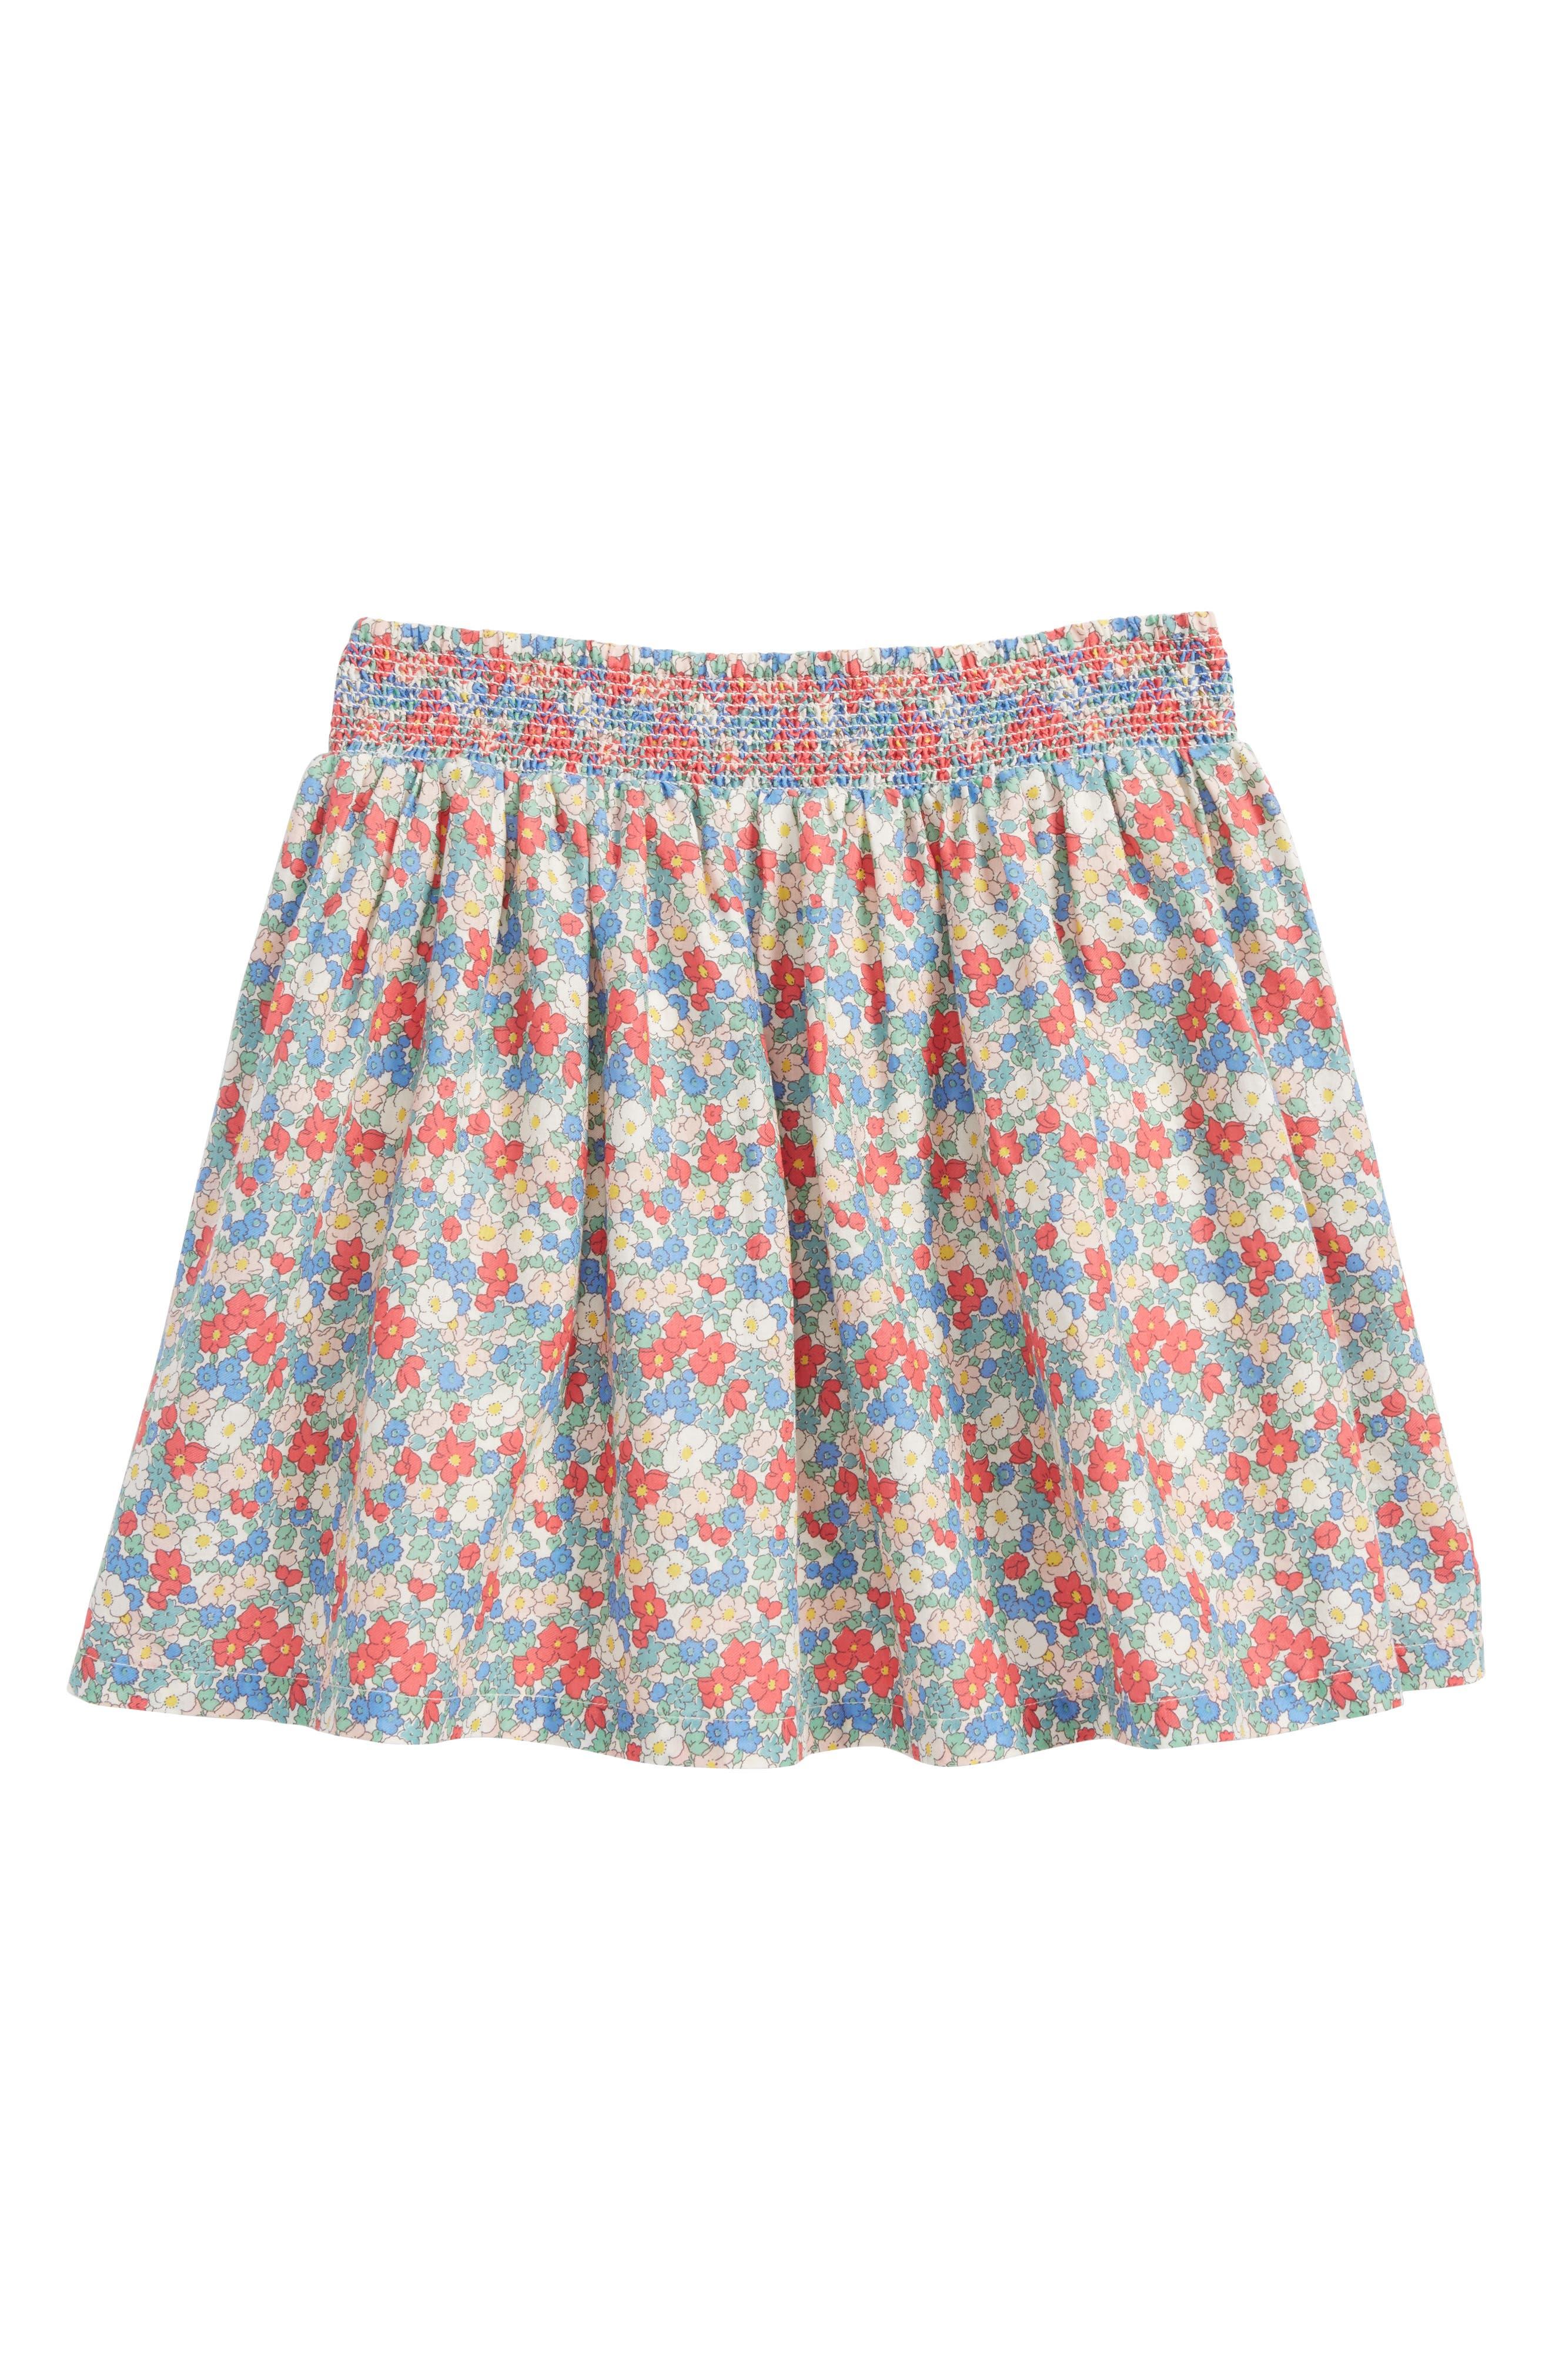 Floral Smocked Cotton Skirt,                             Main thumbnail 1, color,                             Multi Vintage Floral Mul